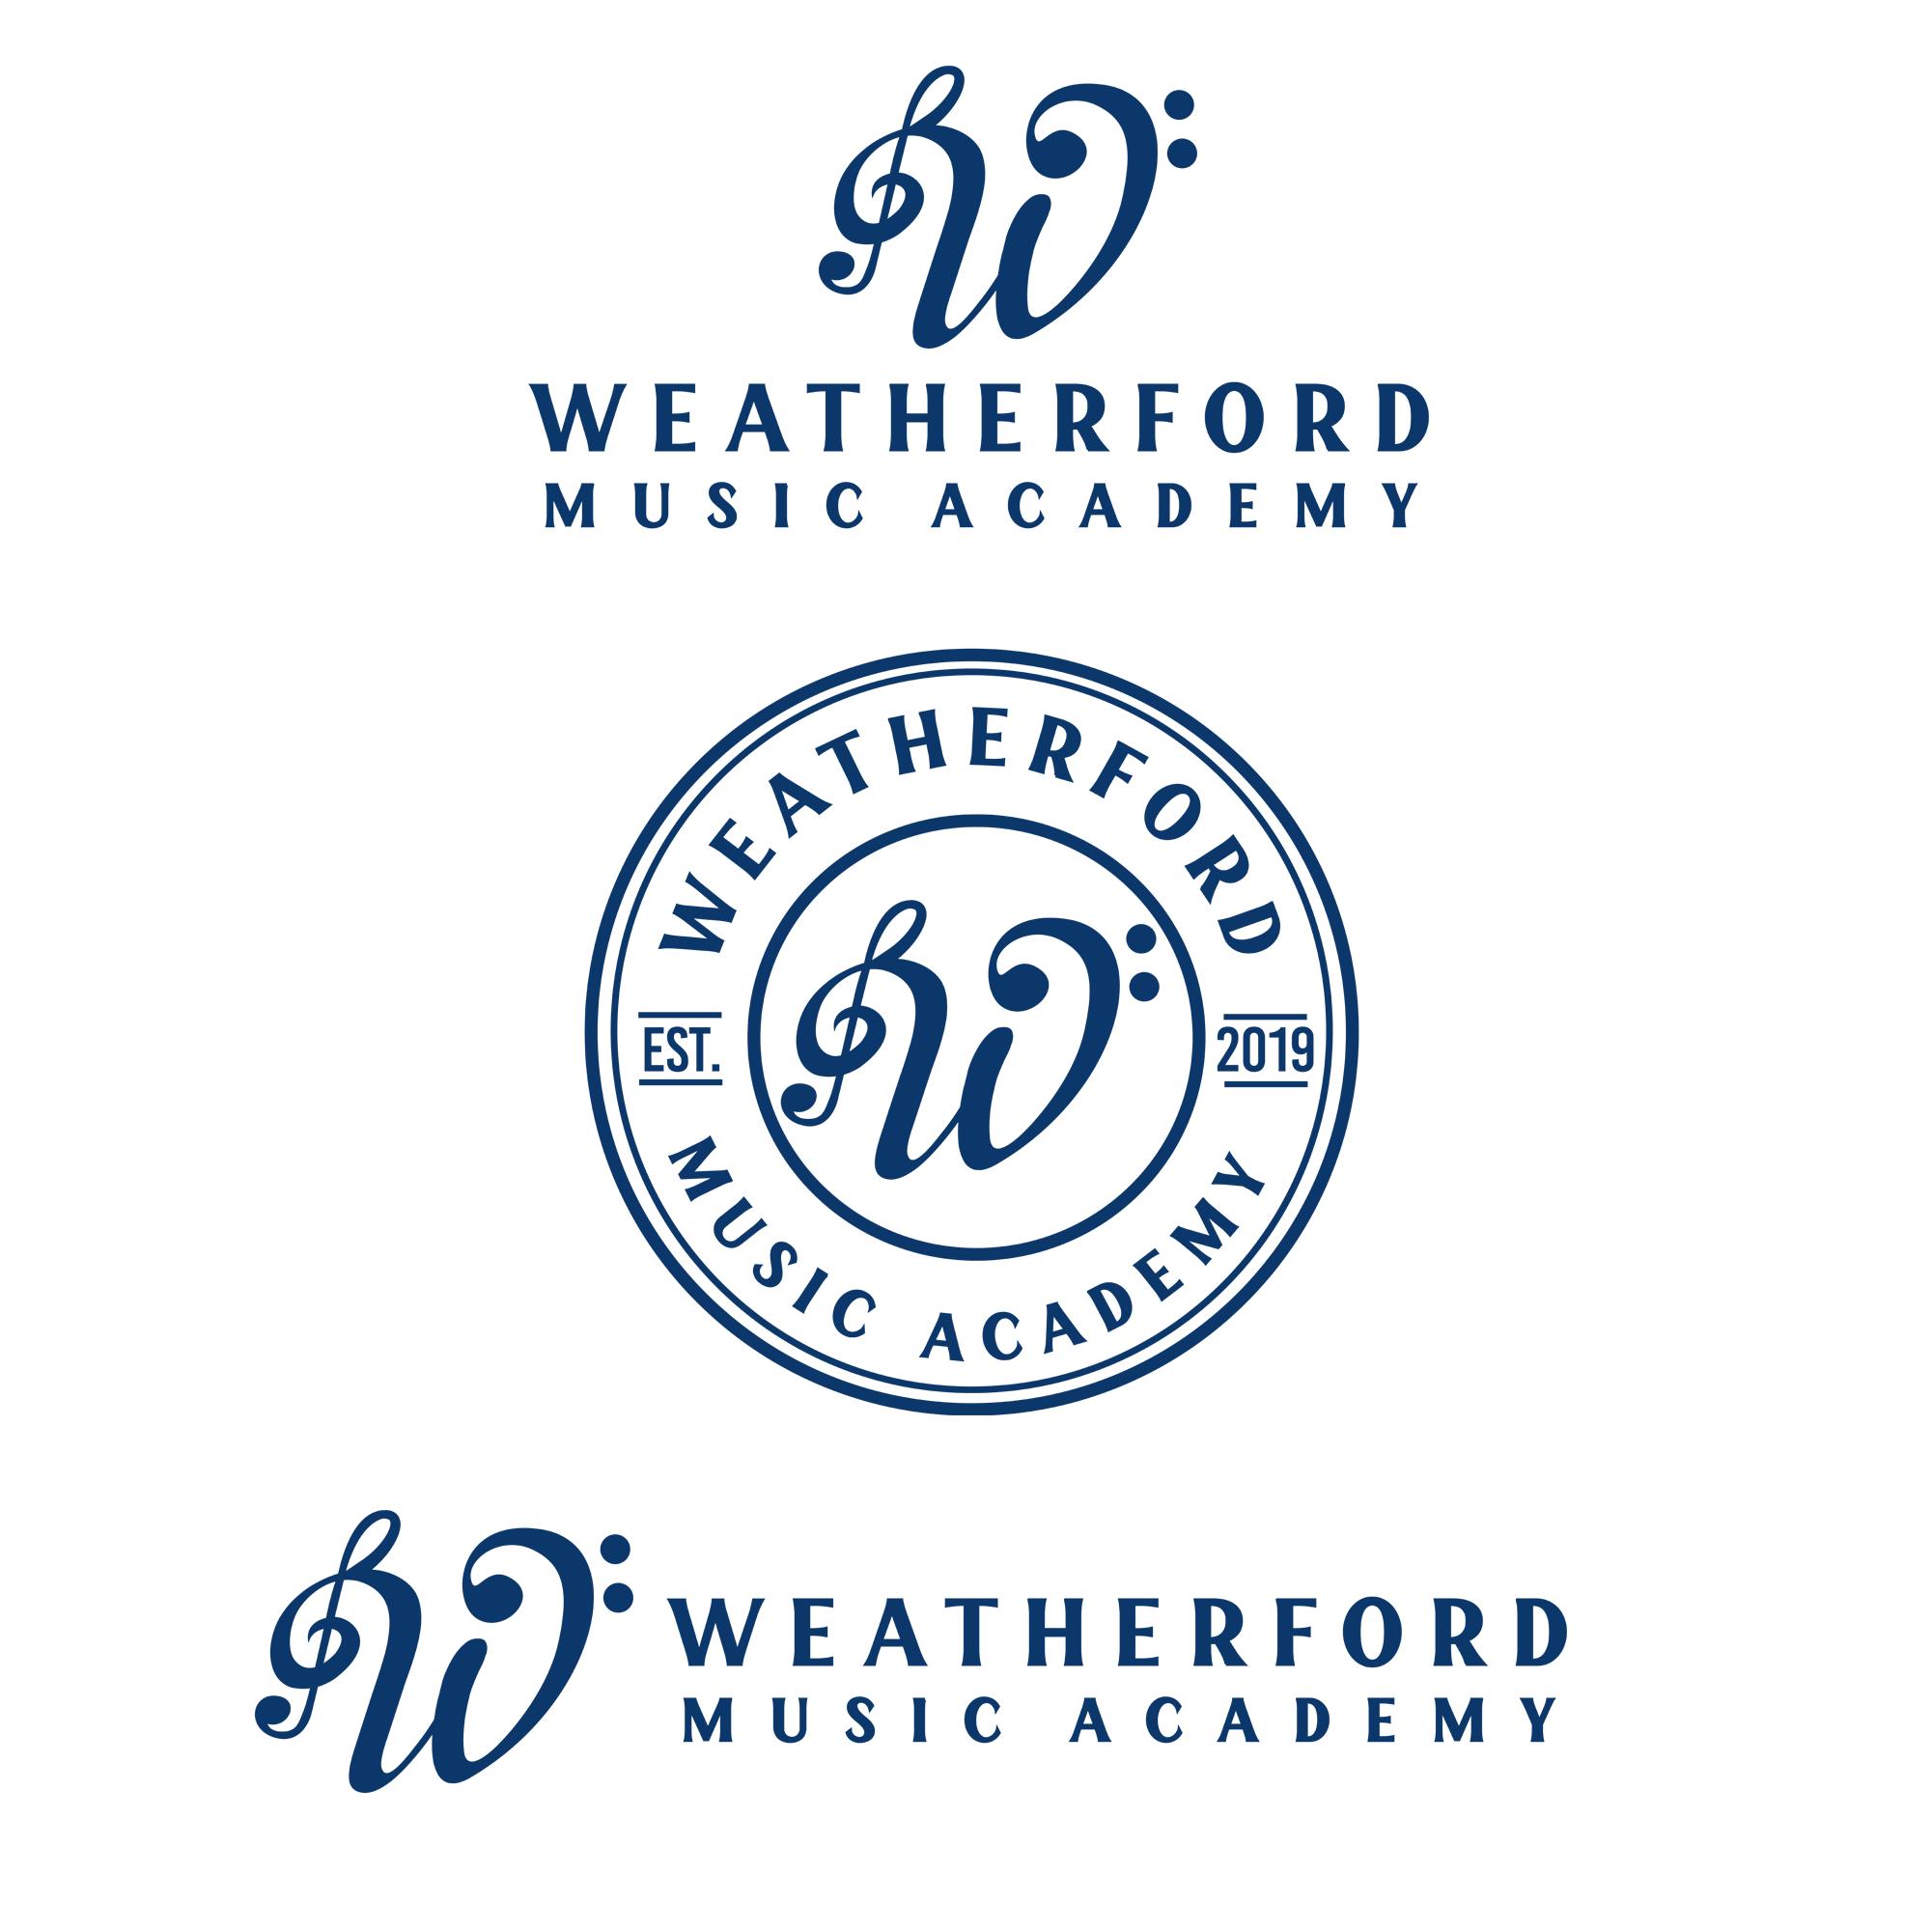 Music School needs a Powerful Logo